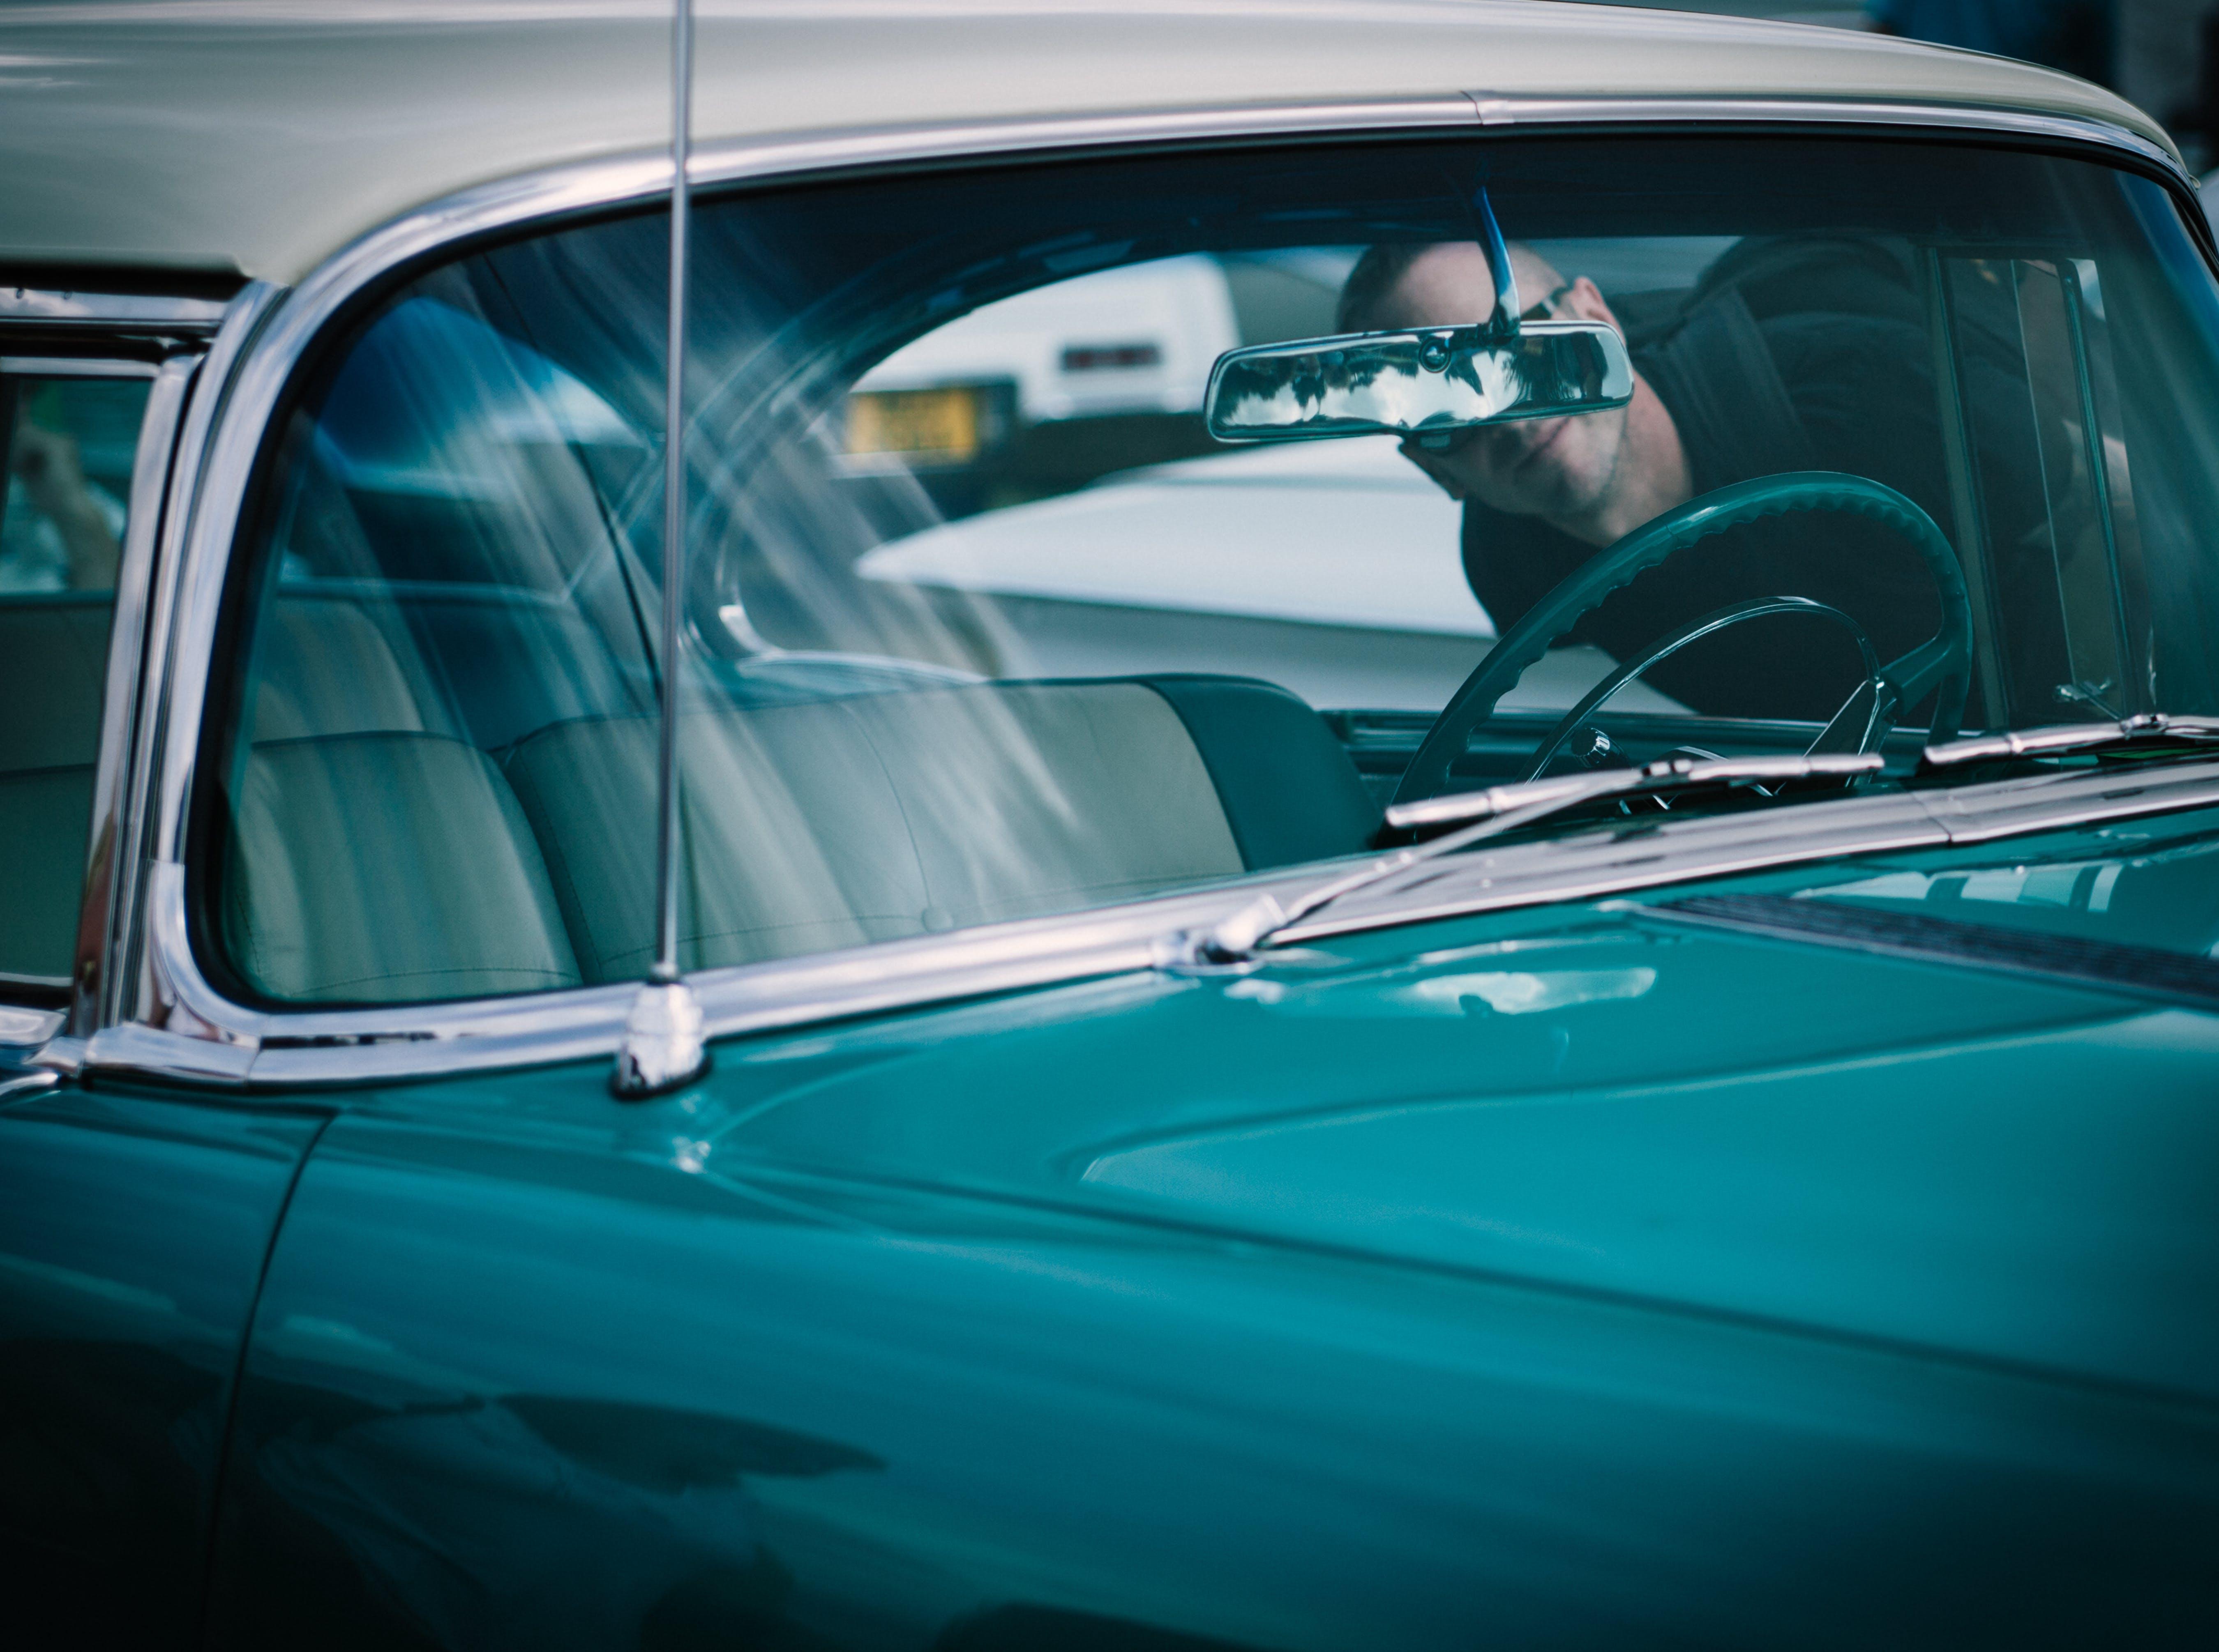 automobile, automotive, blur